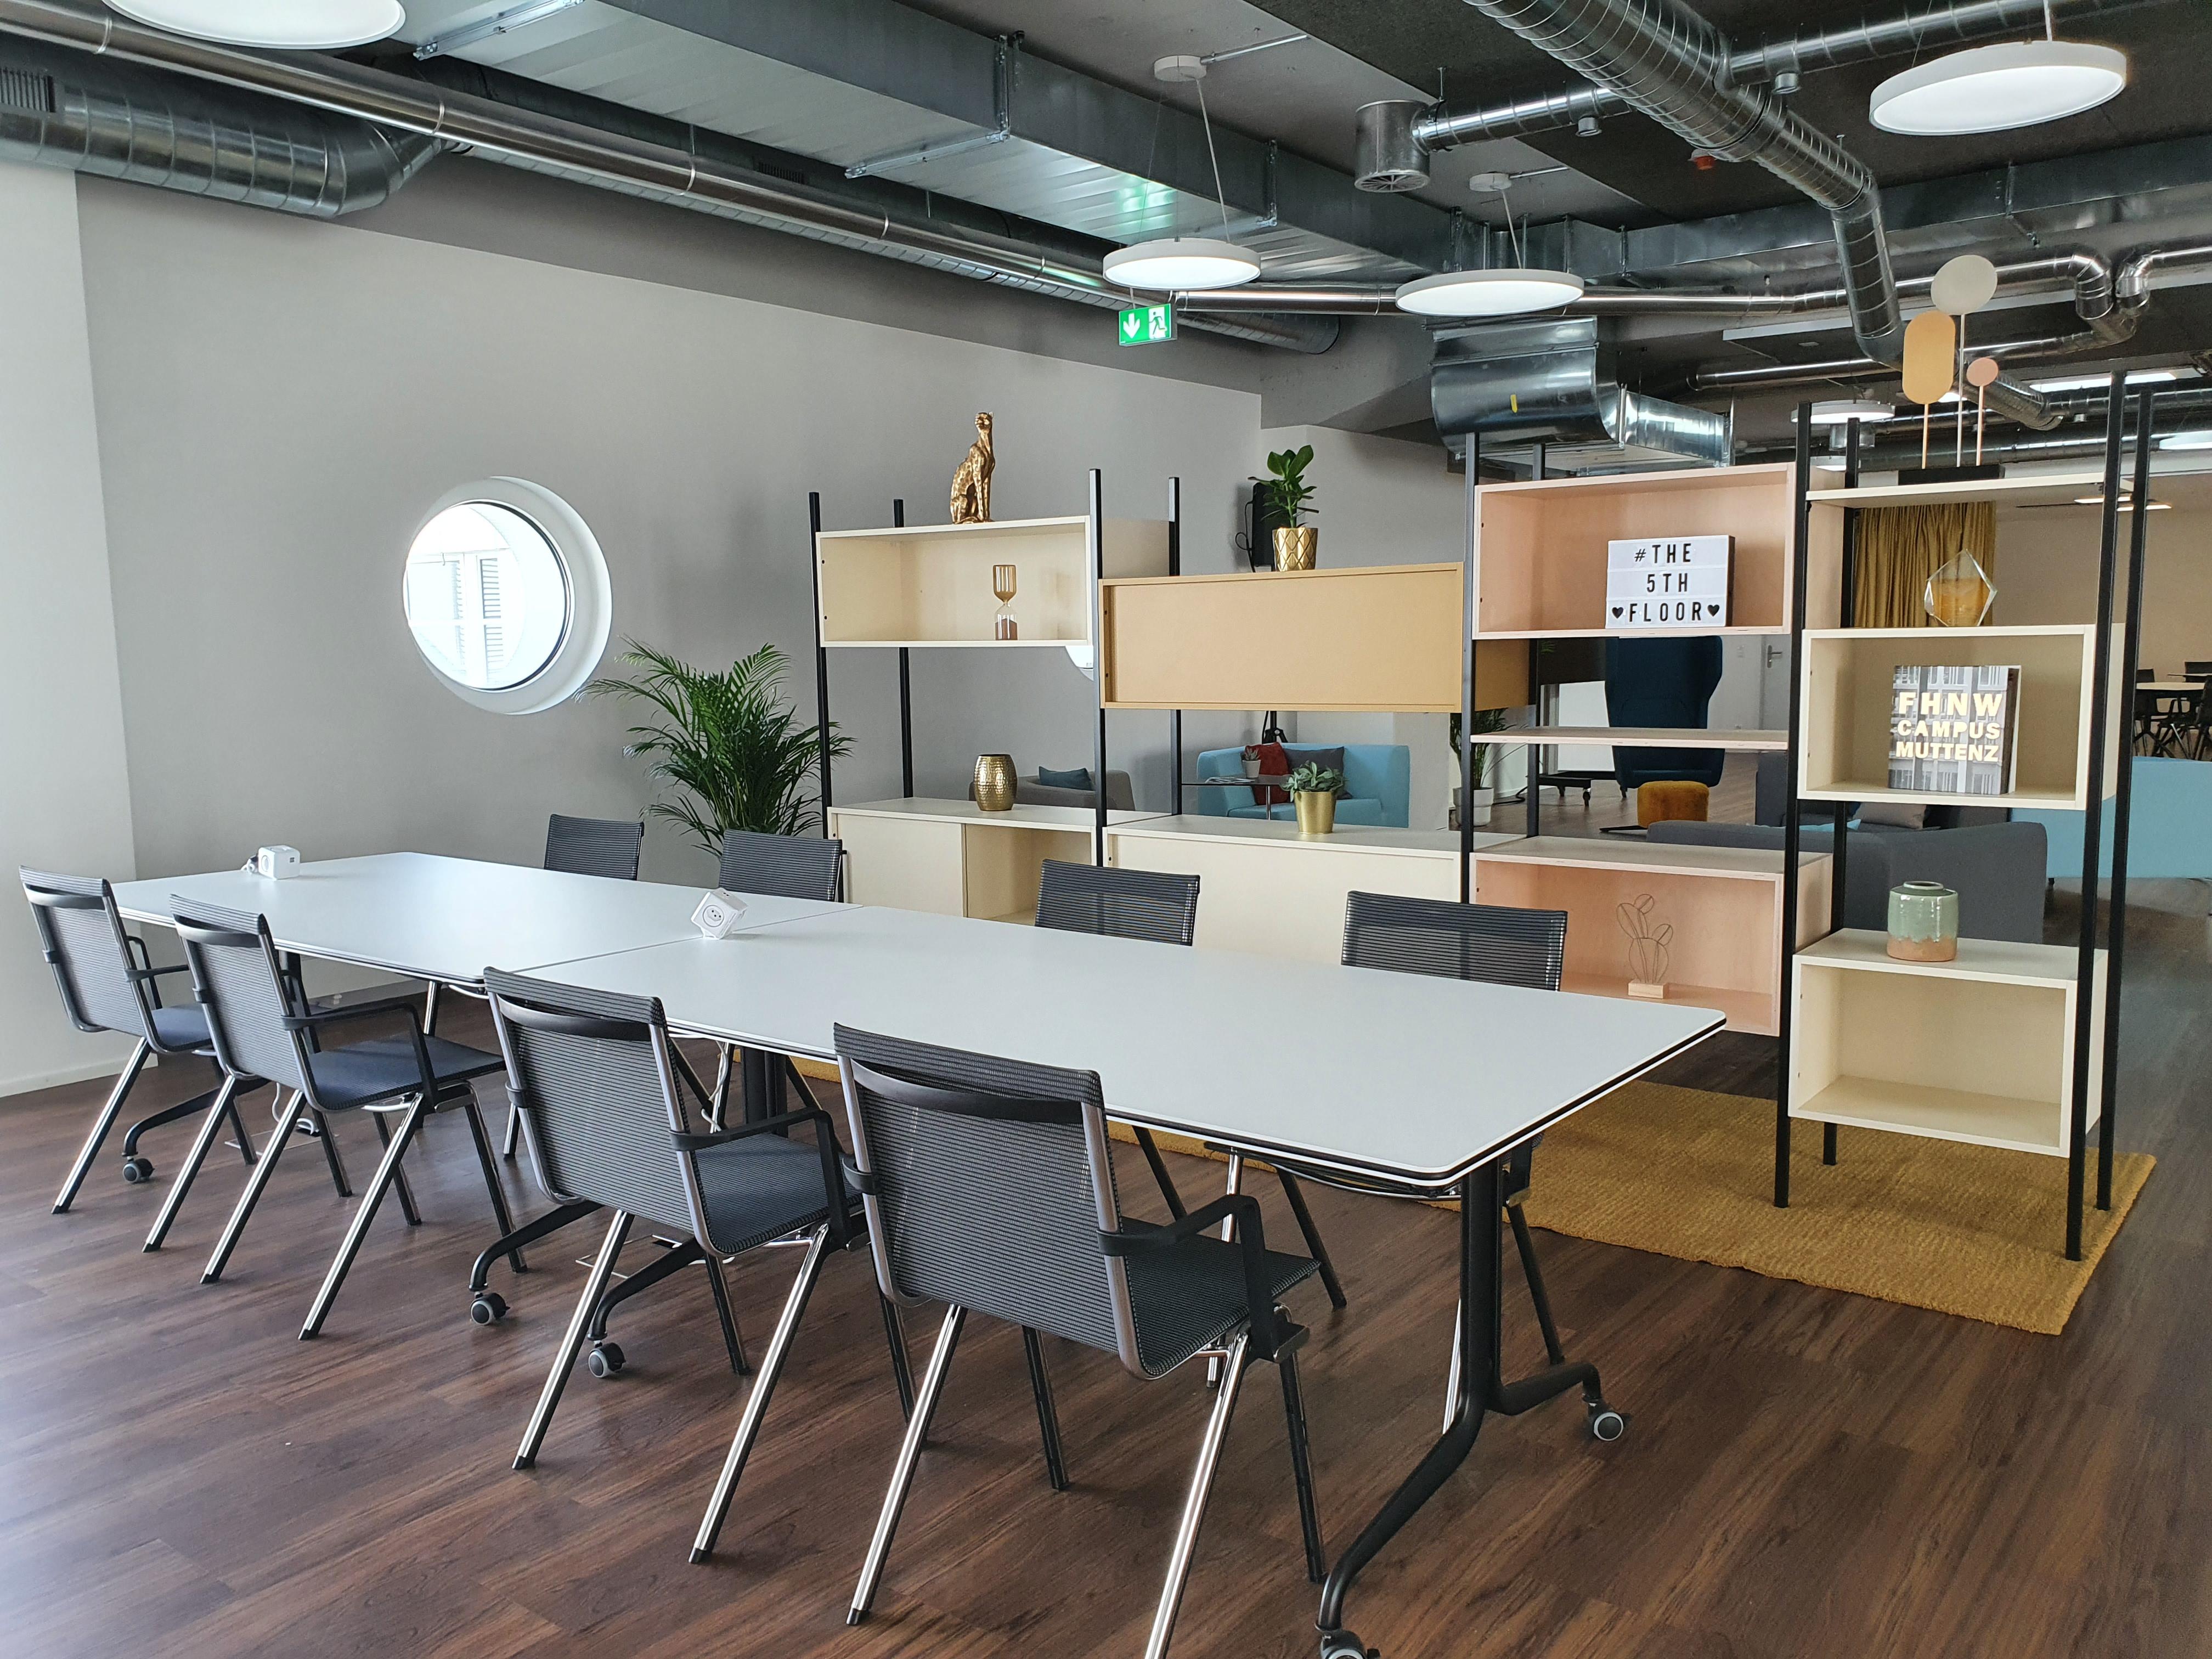 Coworking space 5th floor